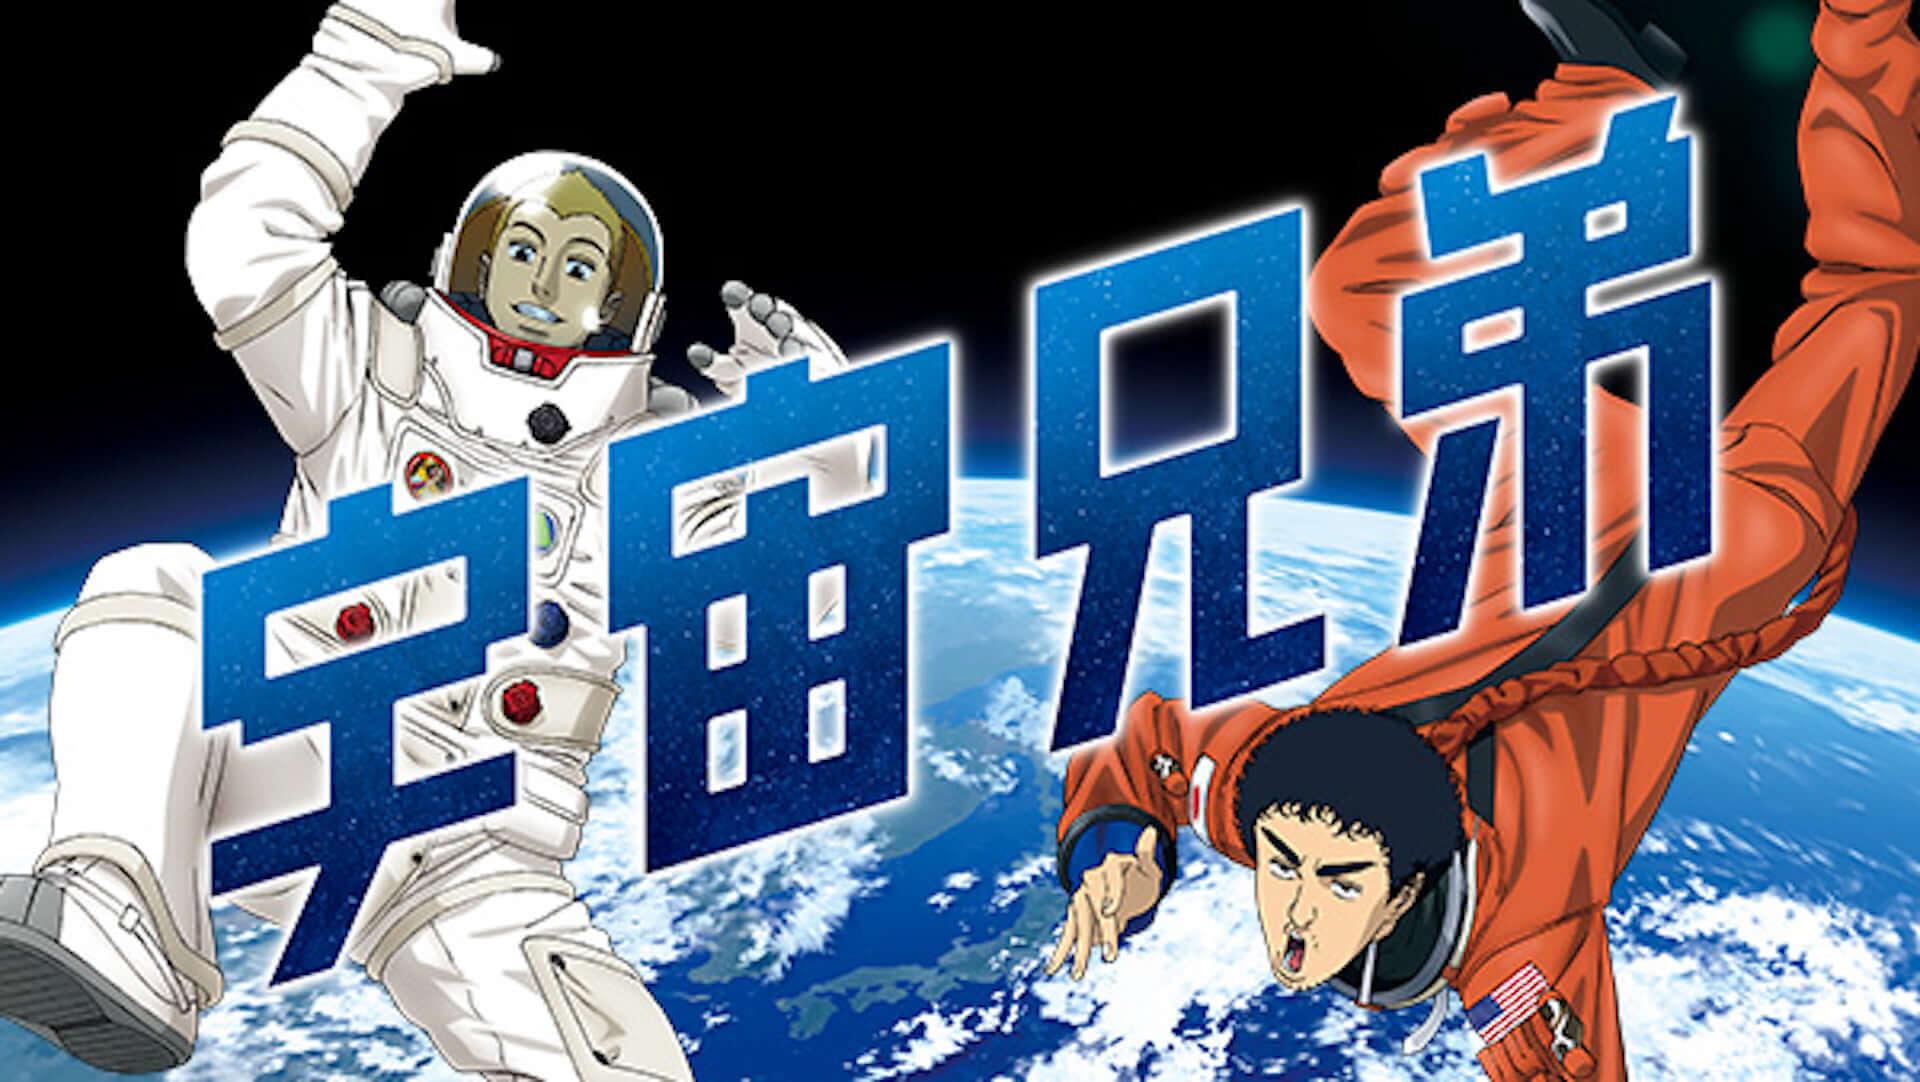 Huluの人気アニメ38作品が無料配信開始!『HUNTER×HUNTER』『ちはやふる』『デスノート』『宇宙兄弟』『はじめの一歩』も見放題 art200417_hulu_anime_5-1920x1082